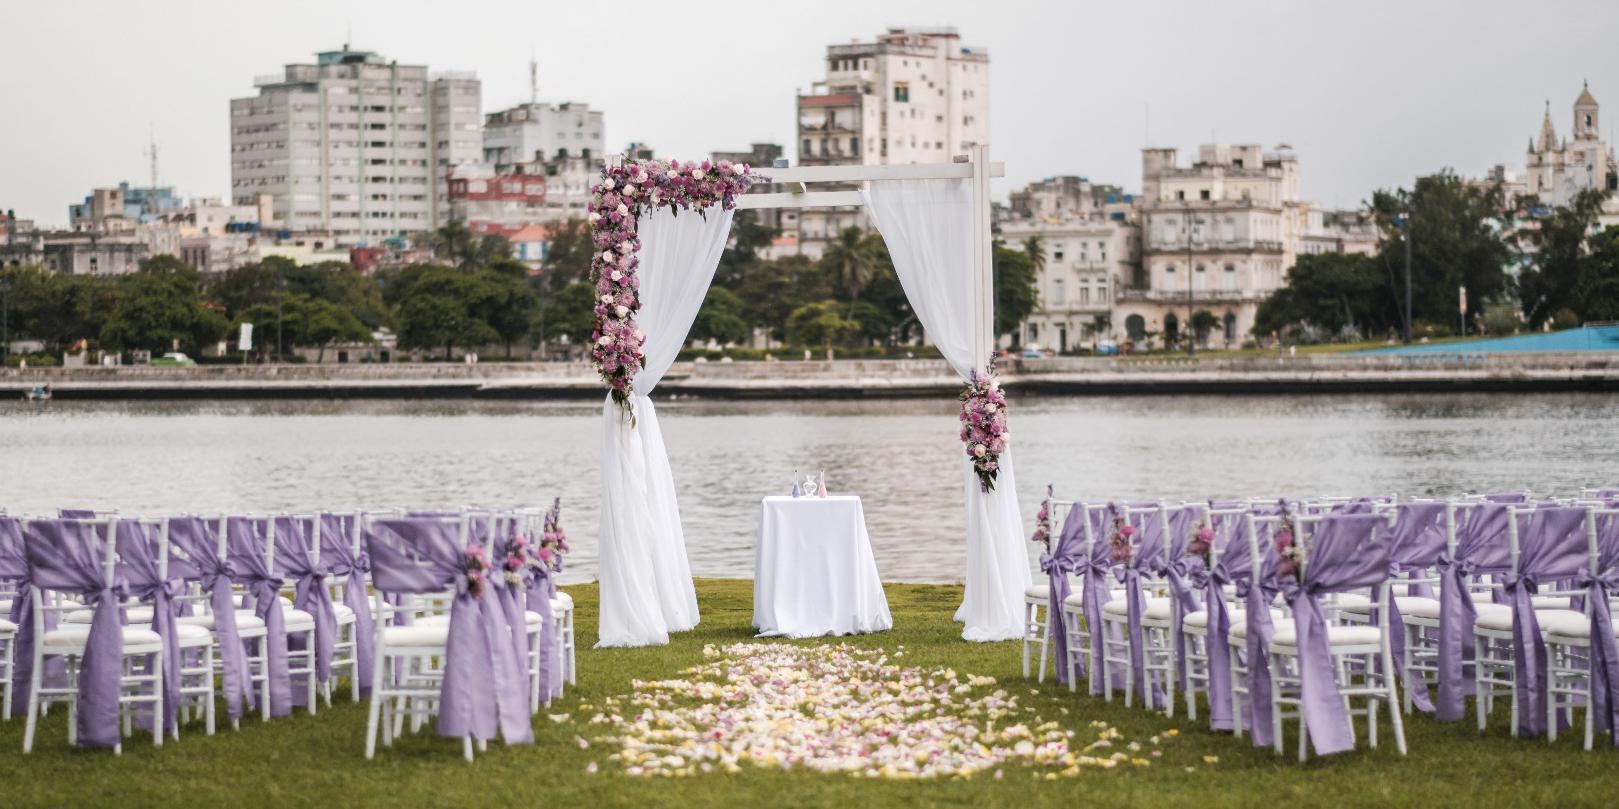 bodas-sin-clasificar-sin-tema-cuba-35461.jpg